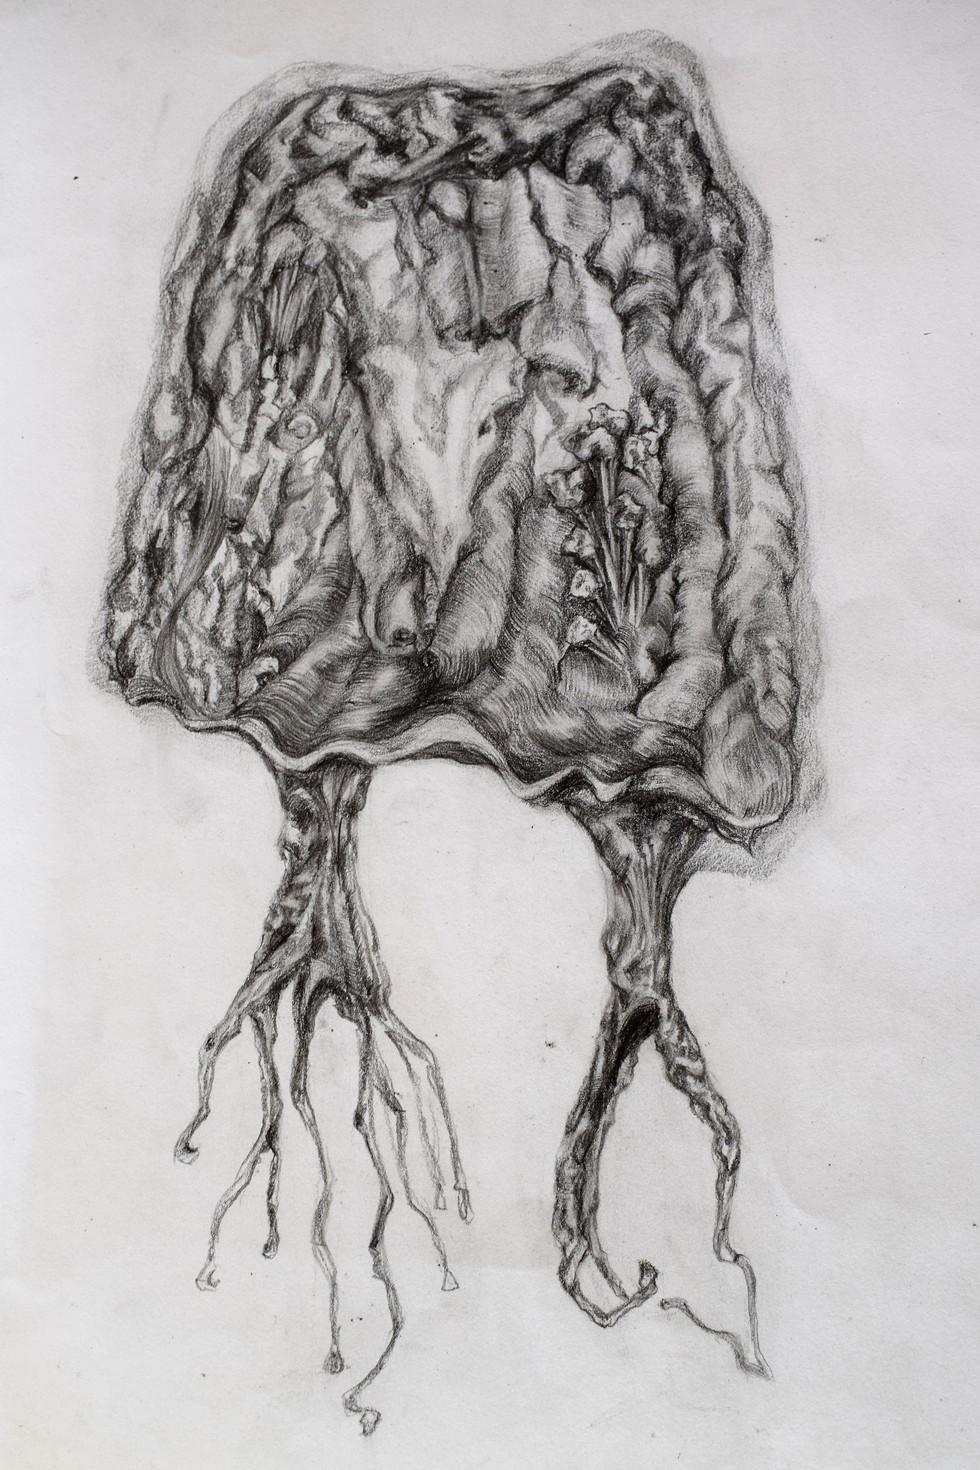 The unconscious' jellyfish - 2017